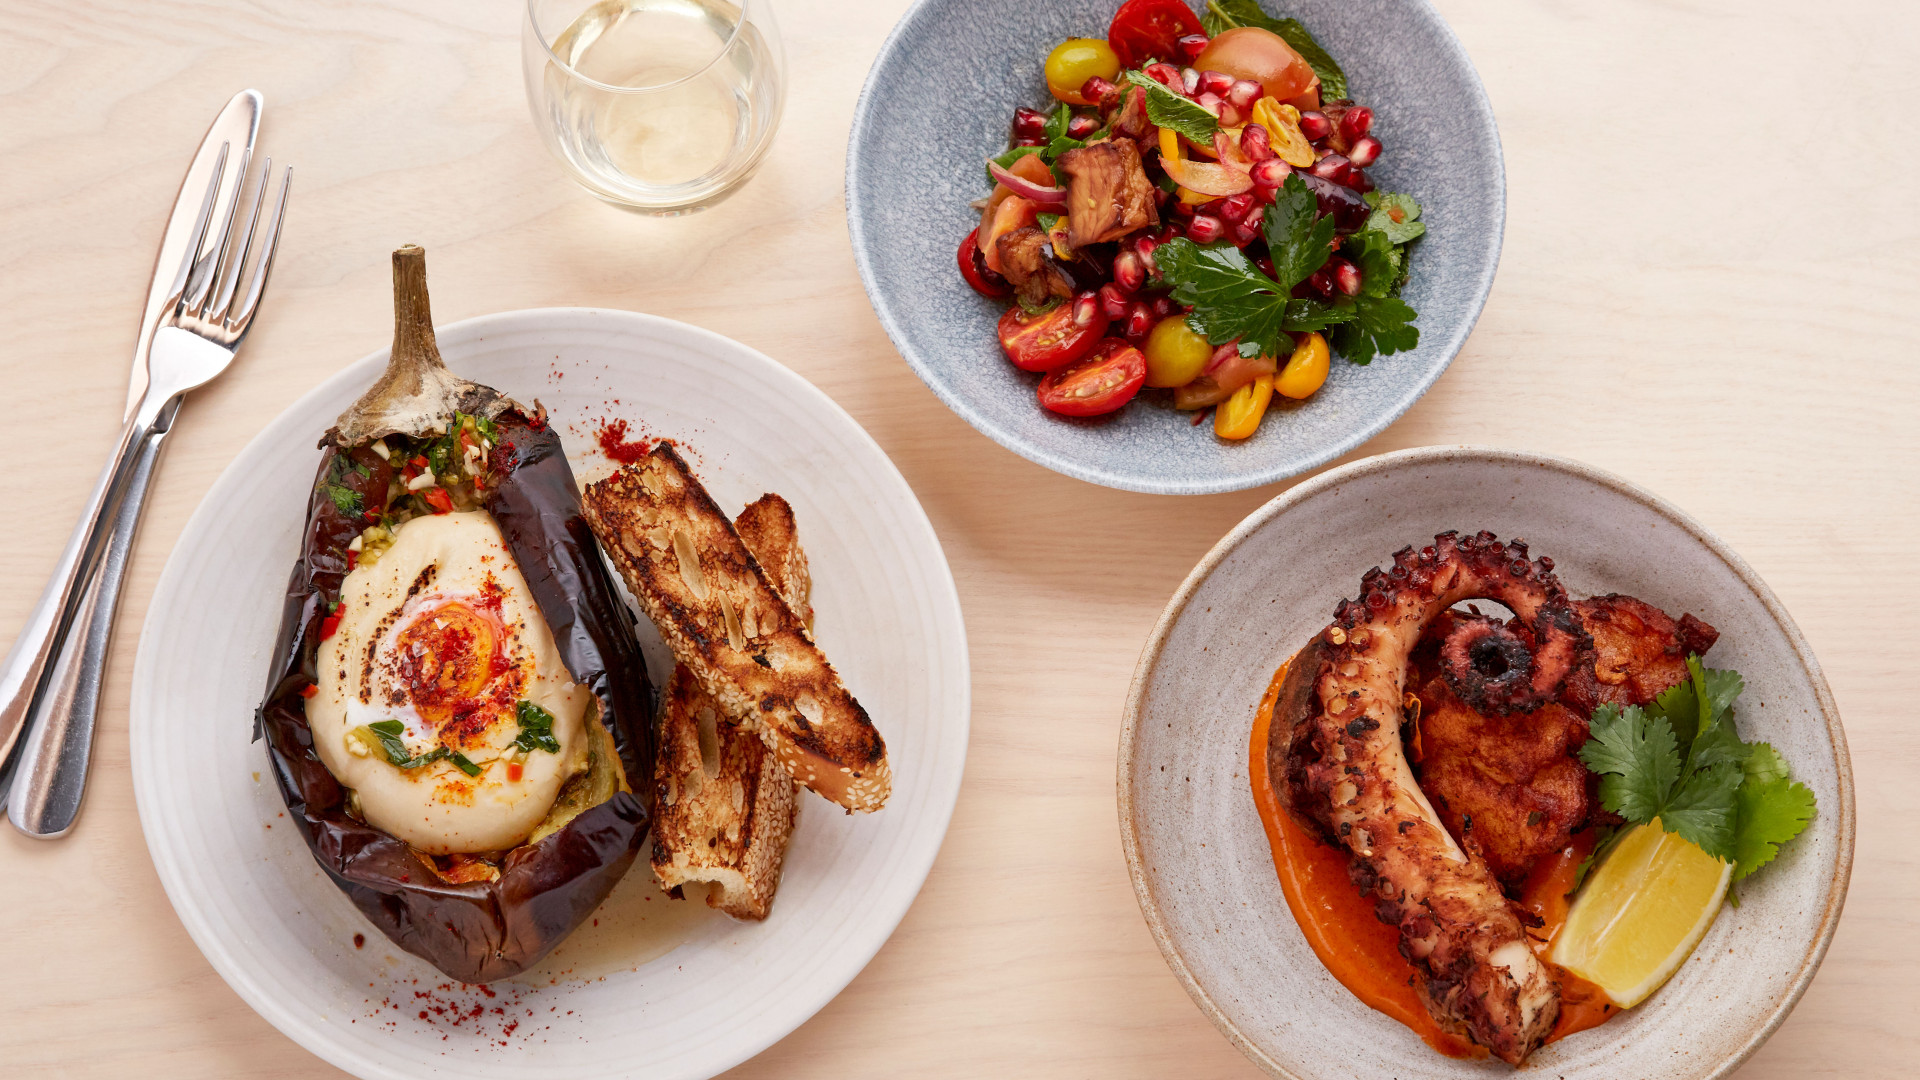 Honey & Smoke: smoky aubergine, octopus and fattoush salad